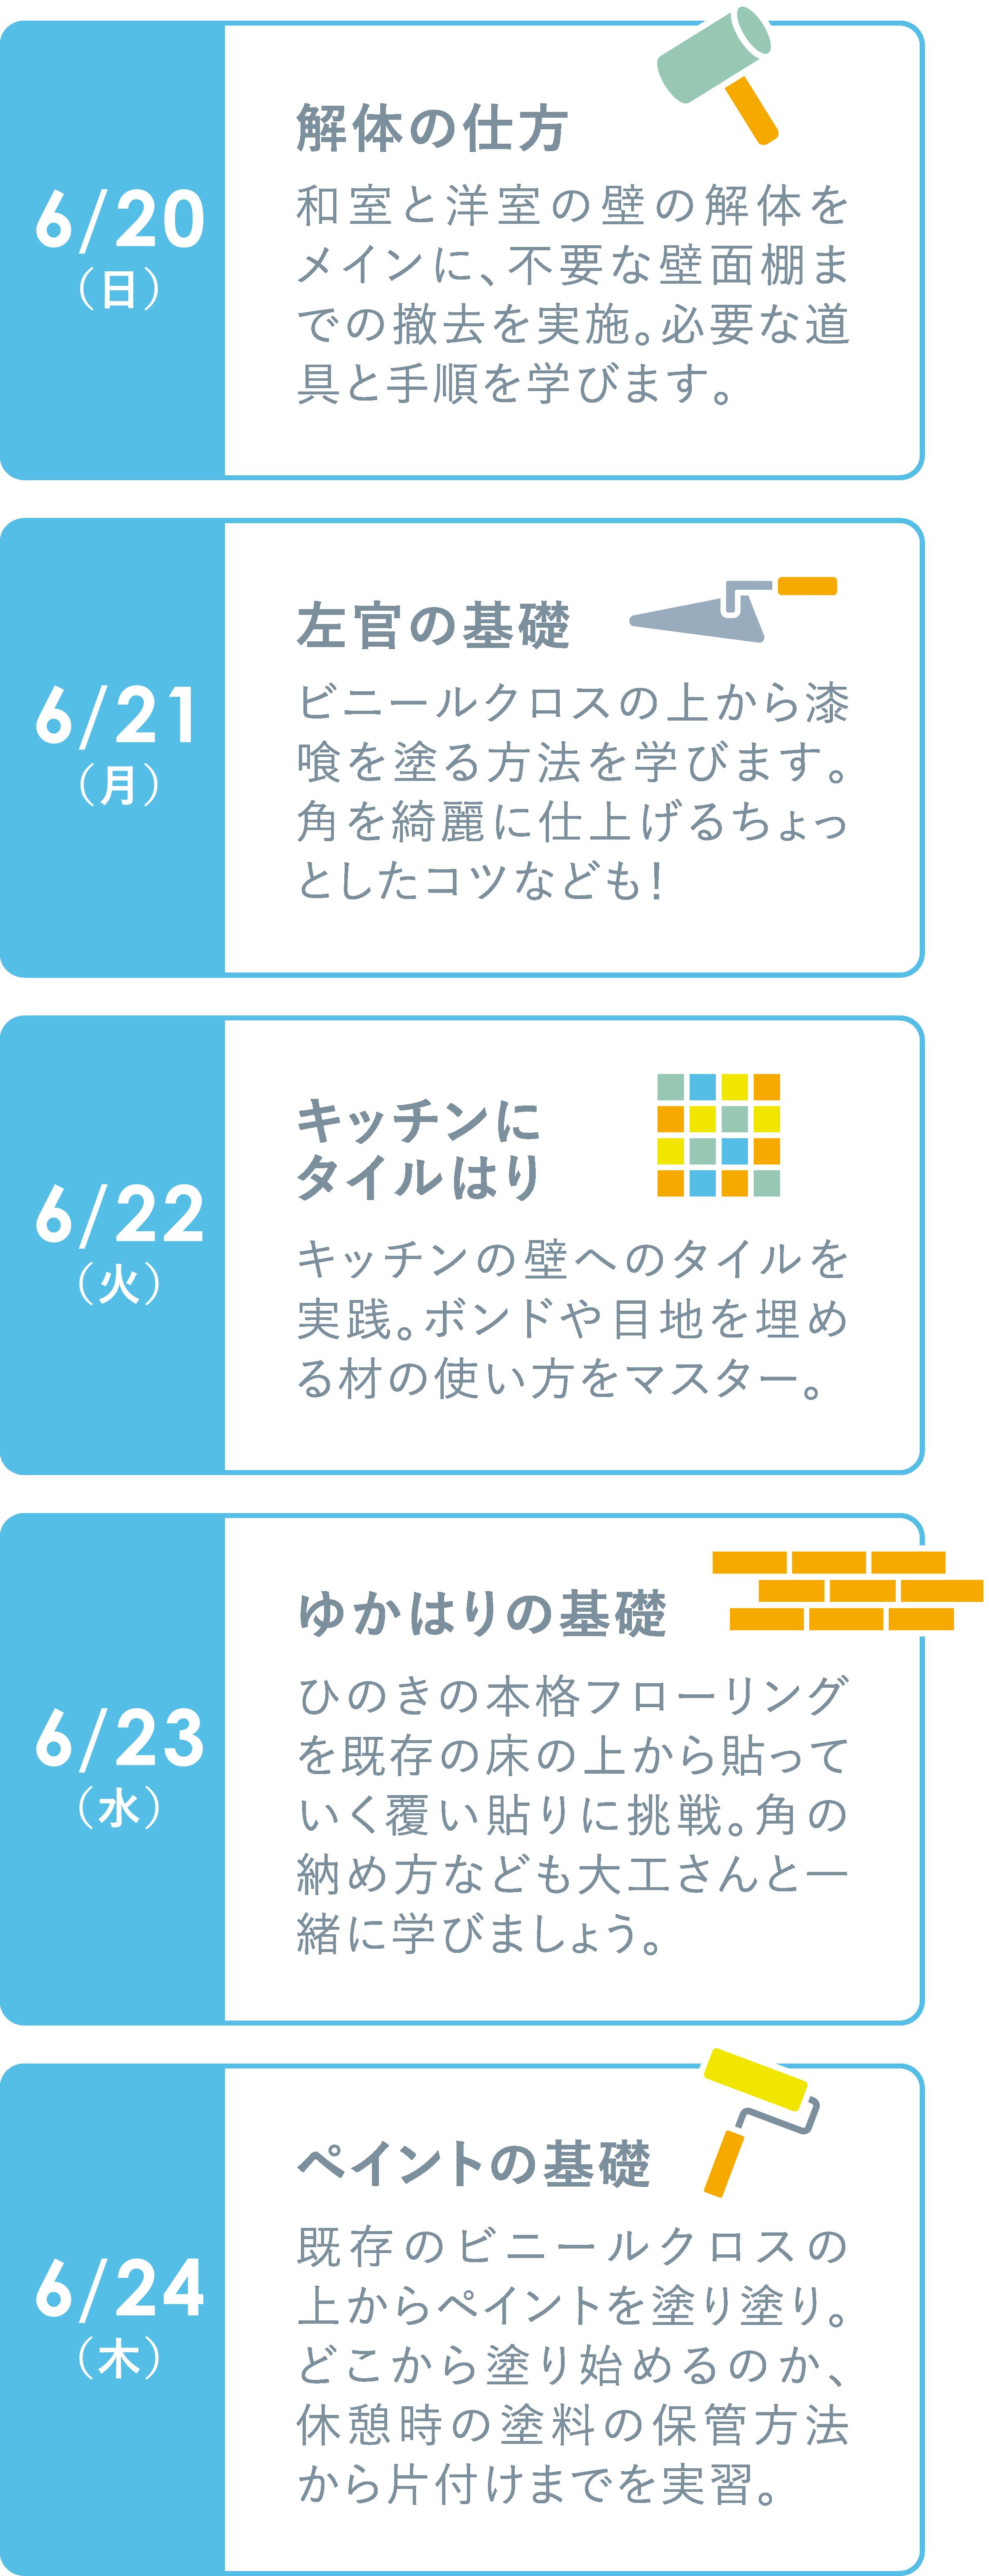 kyoso_yamaguchi_sca_smt@4x